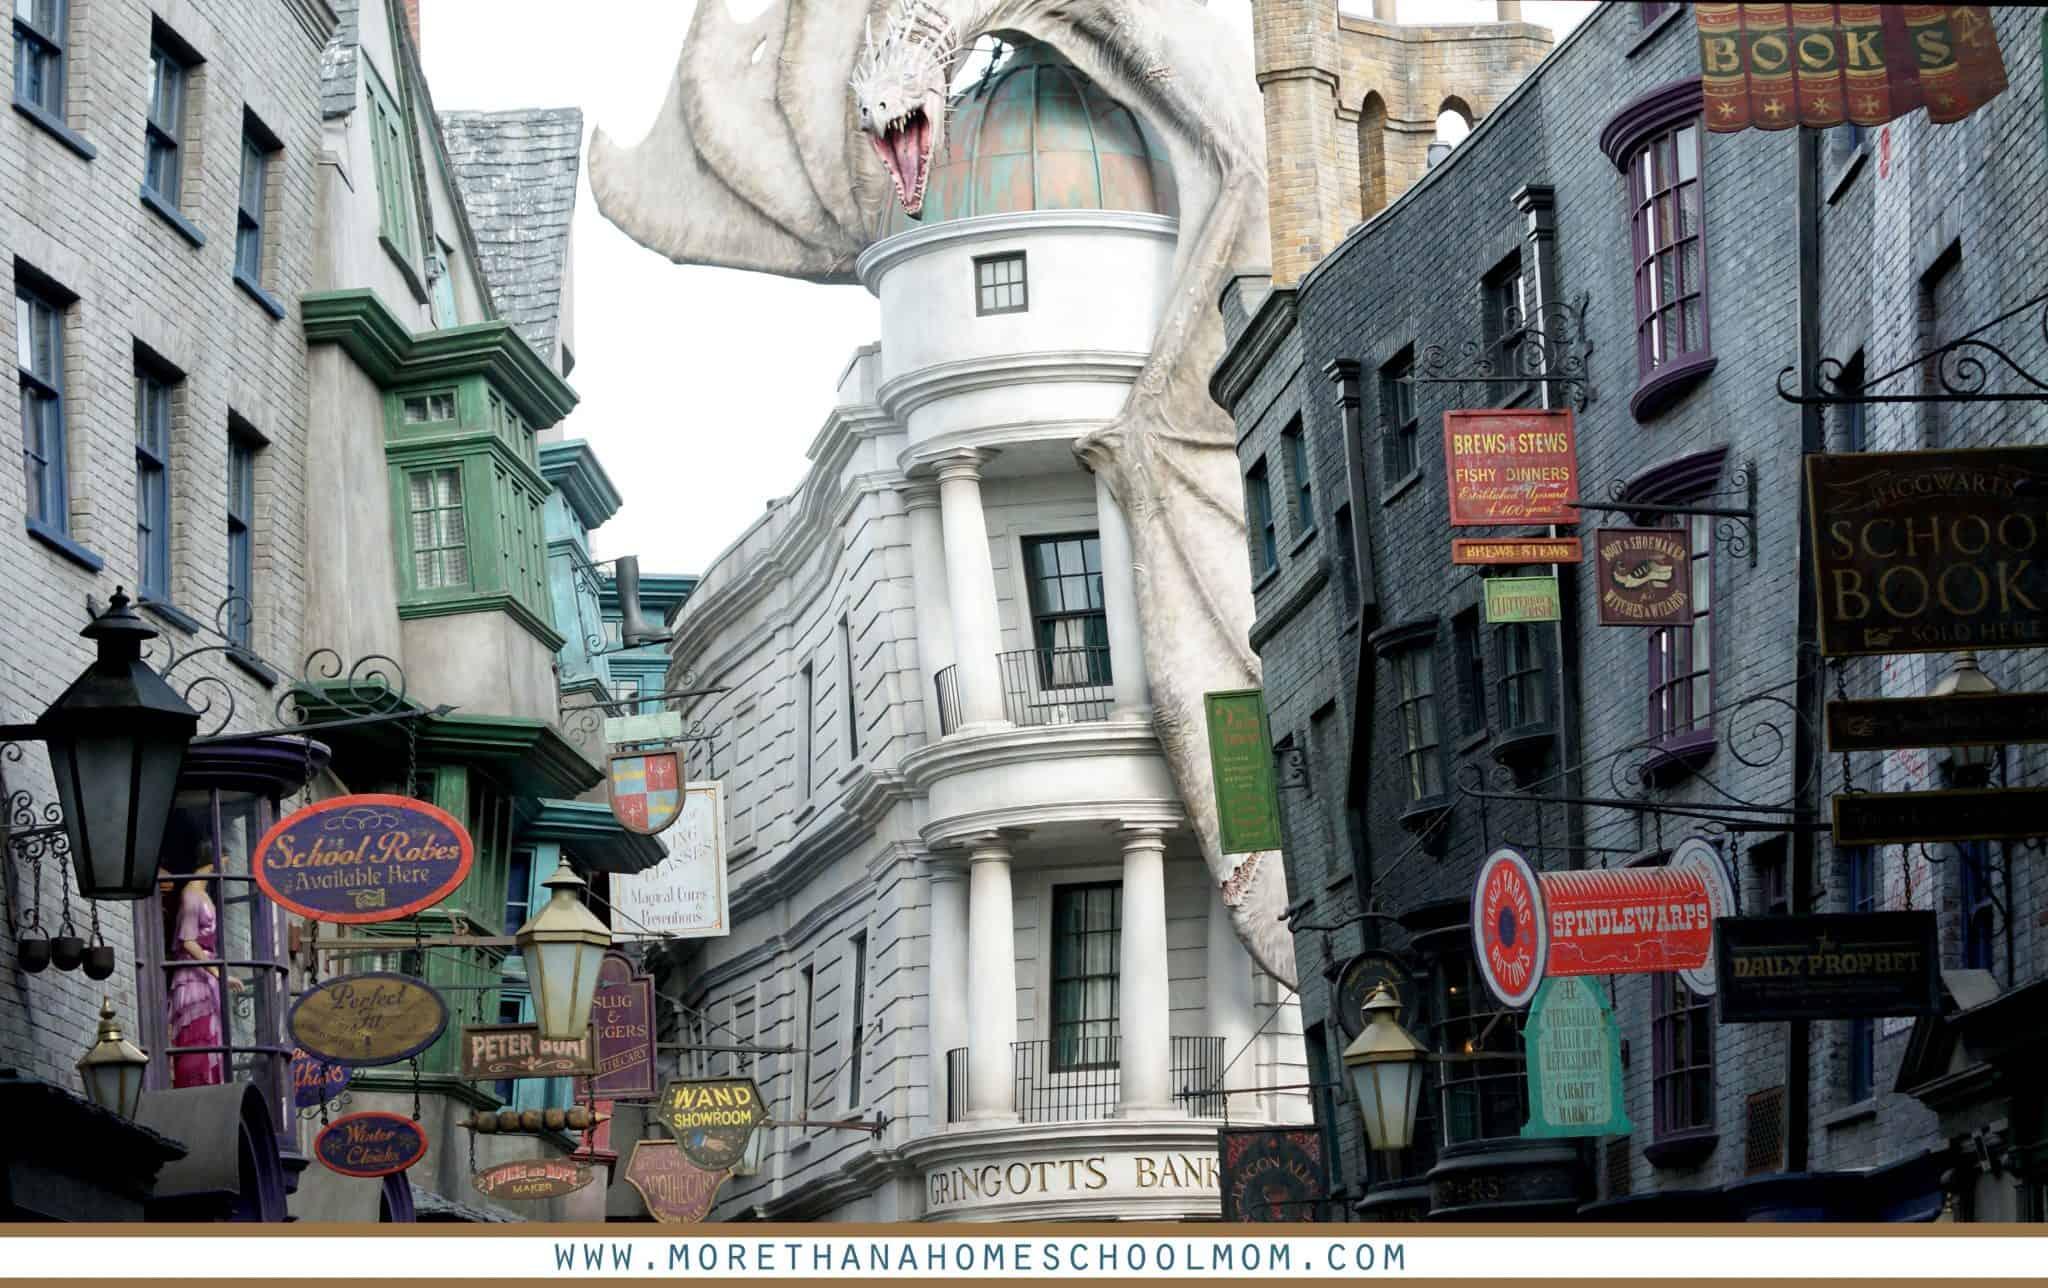 Intro to Diagon Alley with view of dragon on Gringotts bank - #UniversalStudios #DiagonAlley #Travel #Florida #orlando #Universal